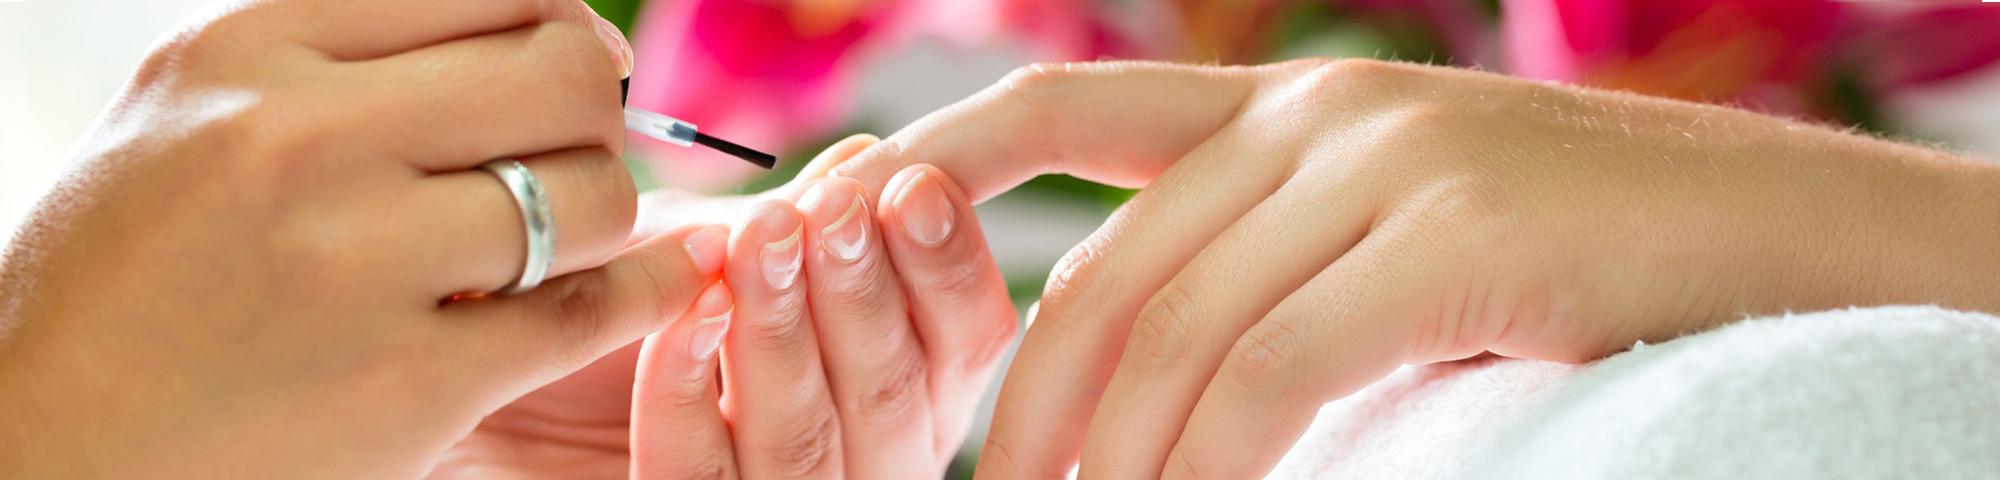 Nail salon Kapiti Kilbirnie,Acrylic nail spa Johnsonville Porirua